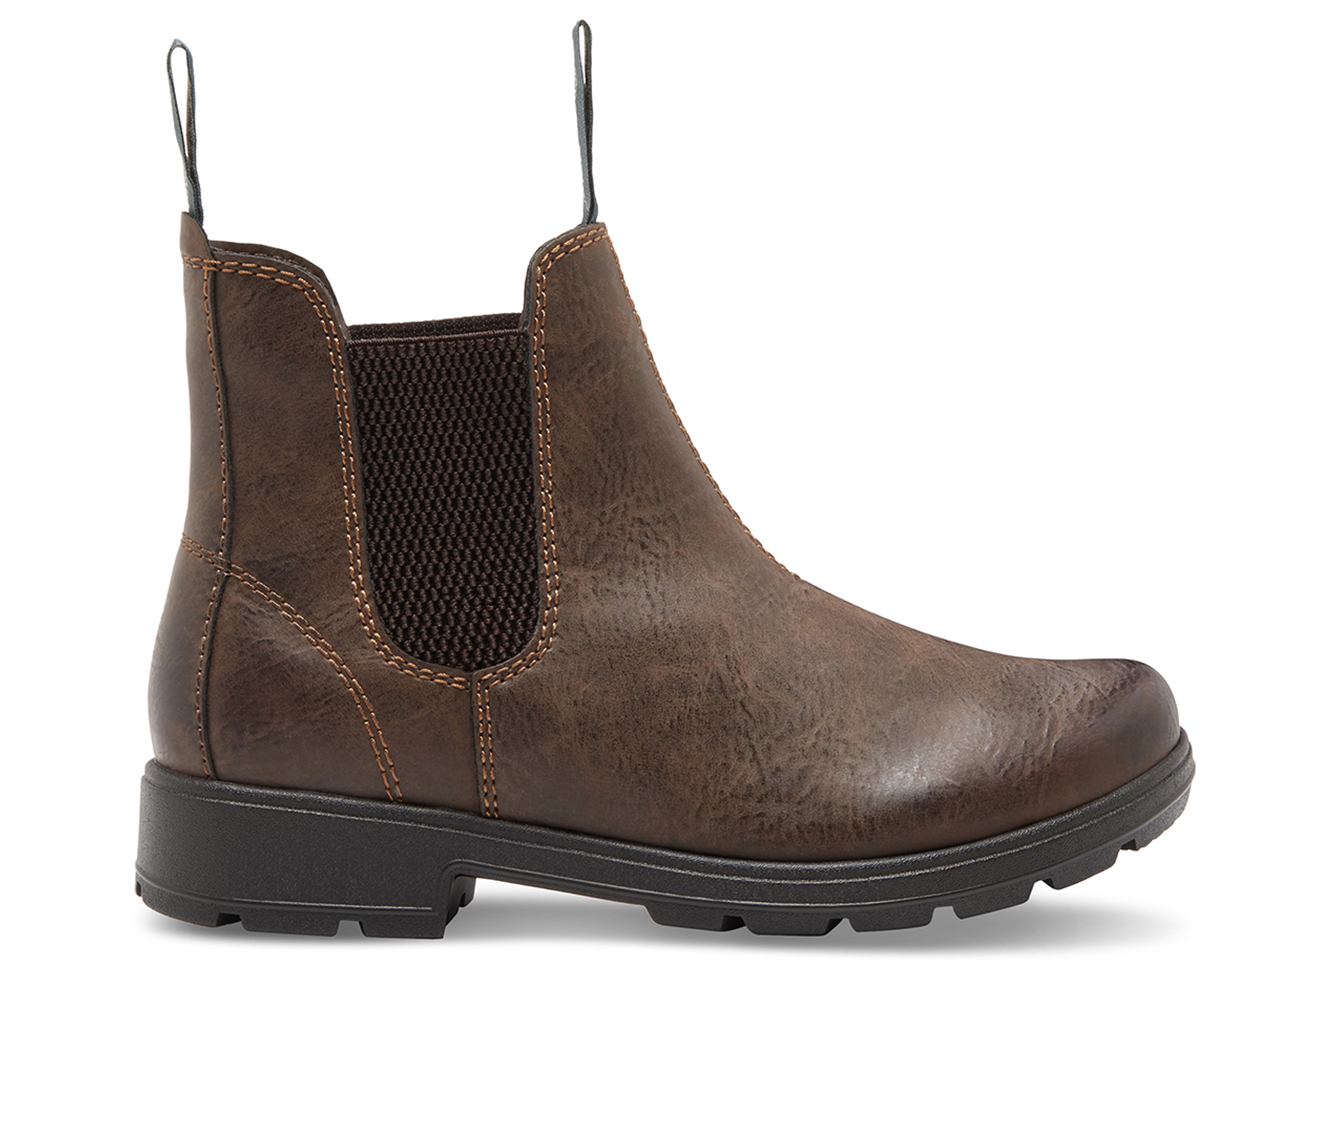 Eastland Baja Women's Boots (Brown - Leather)